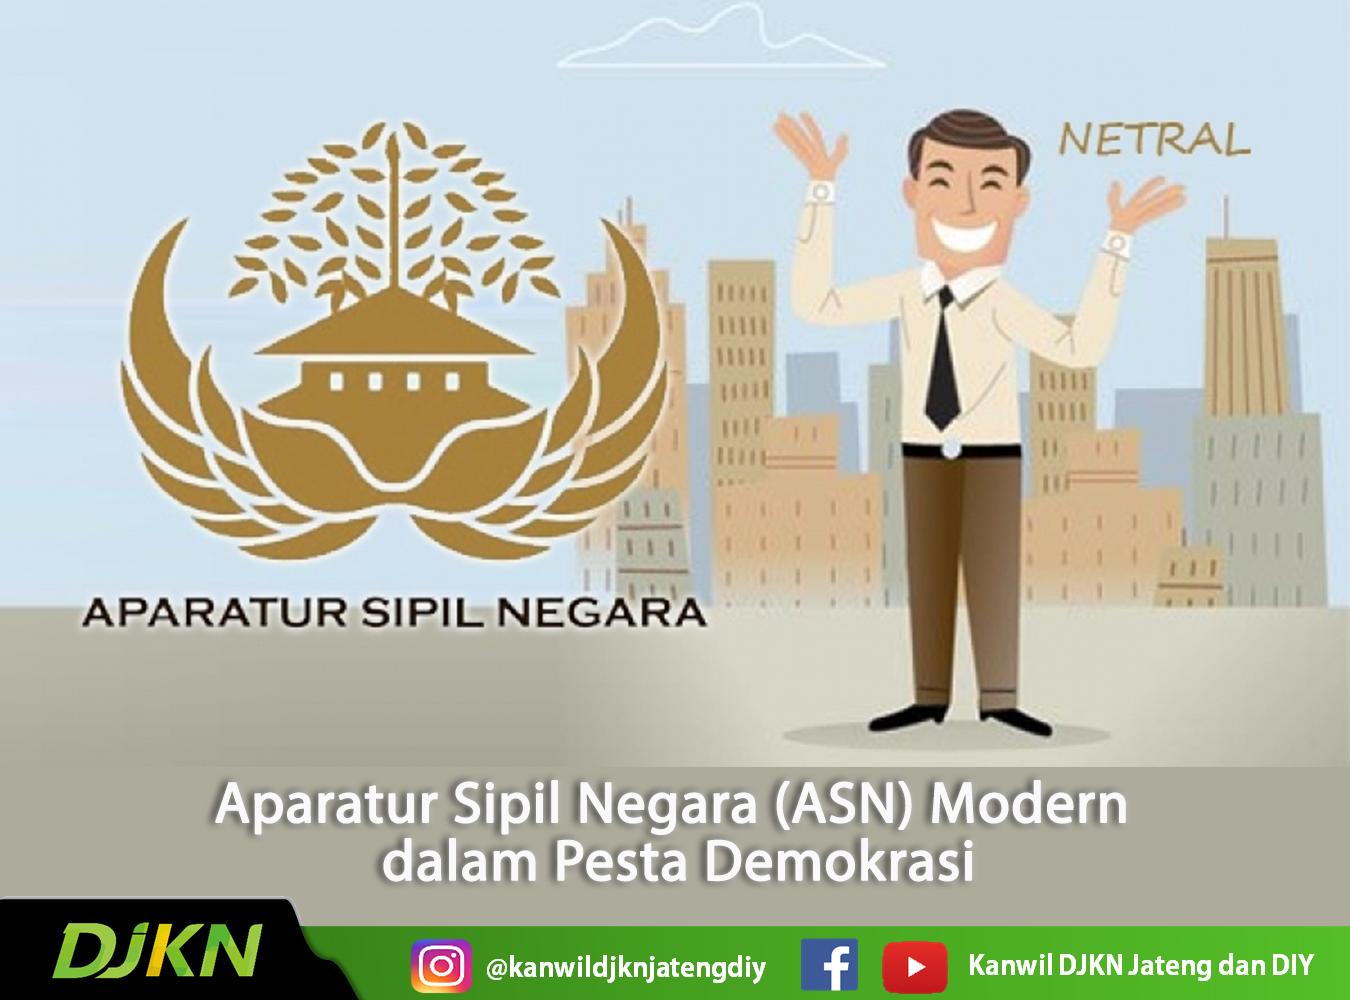 Aparatur Sipil Negara (ASN) Modern dalam Pesta Demokrasi